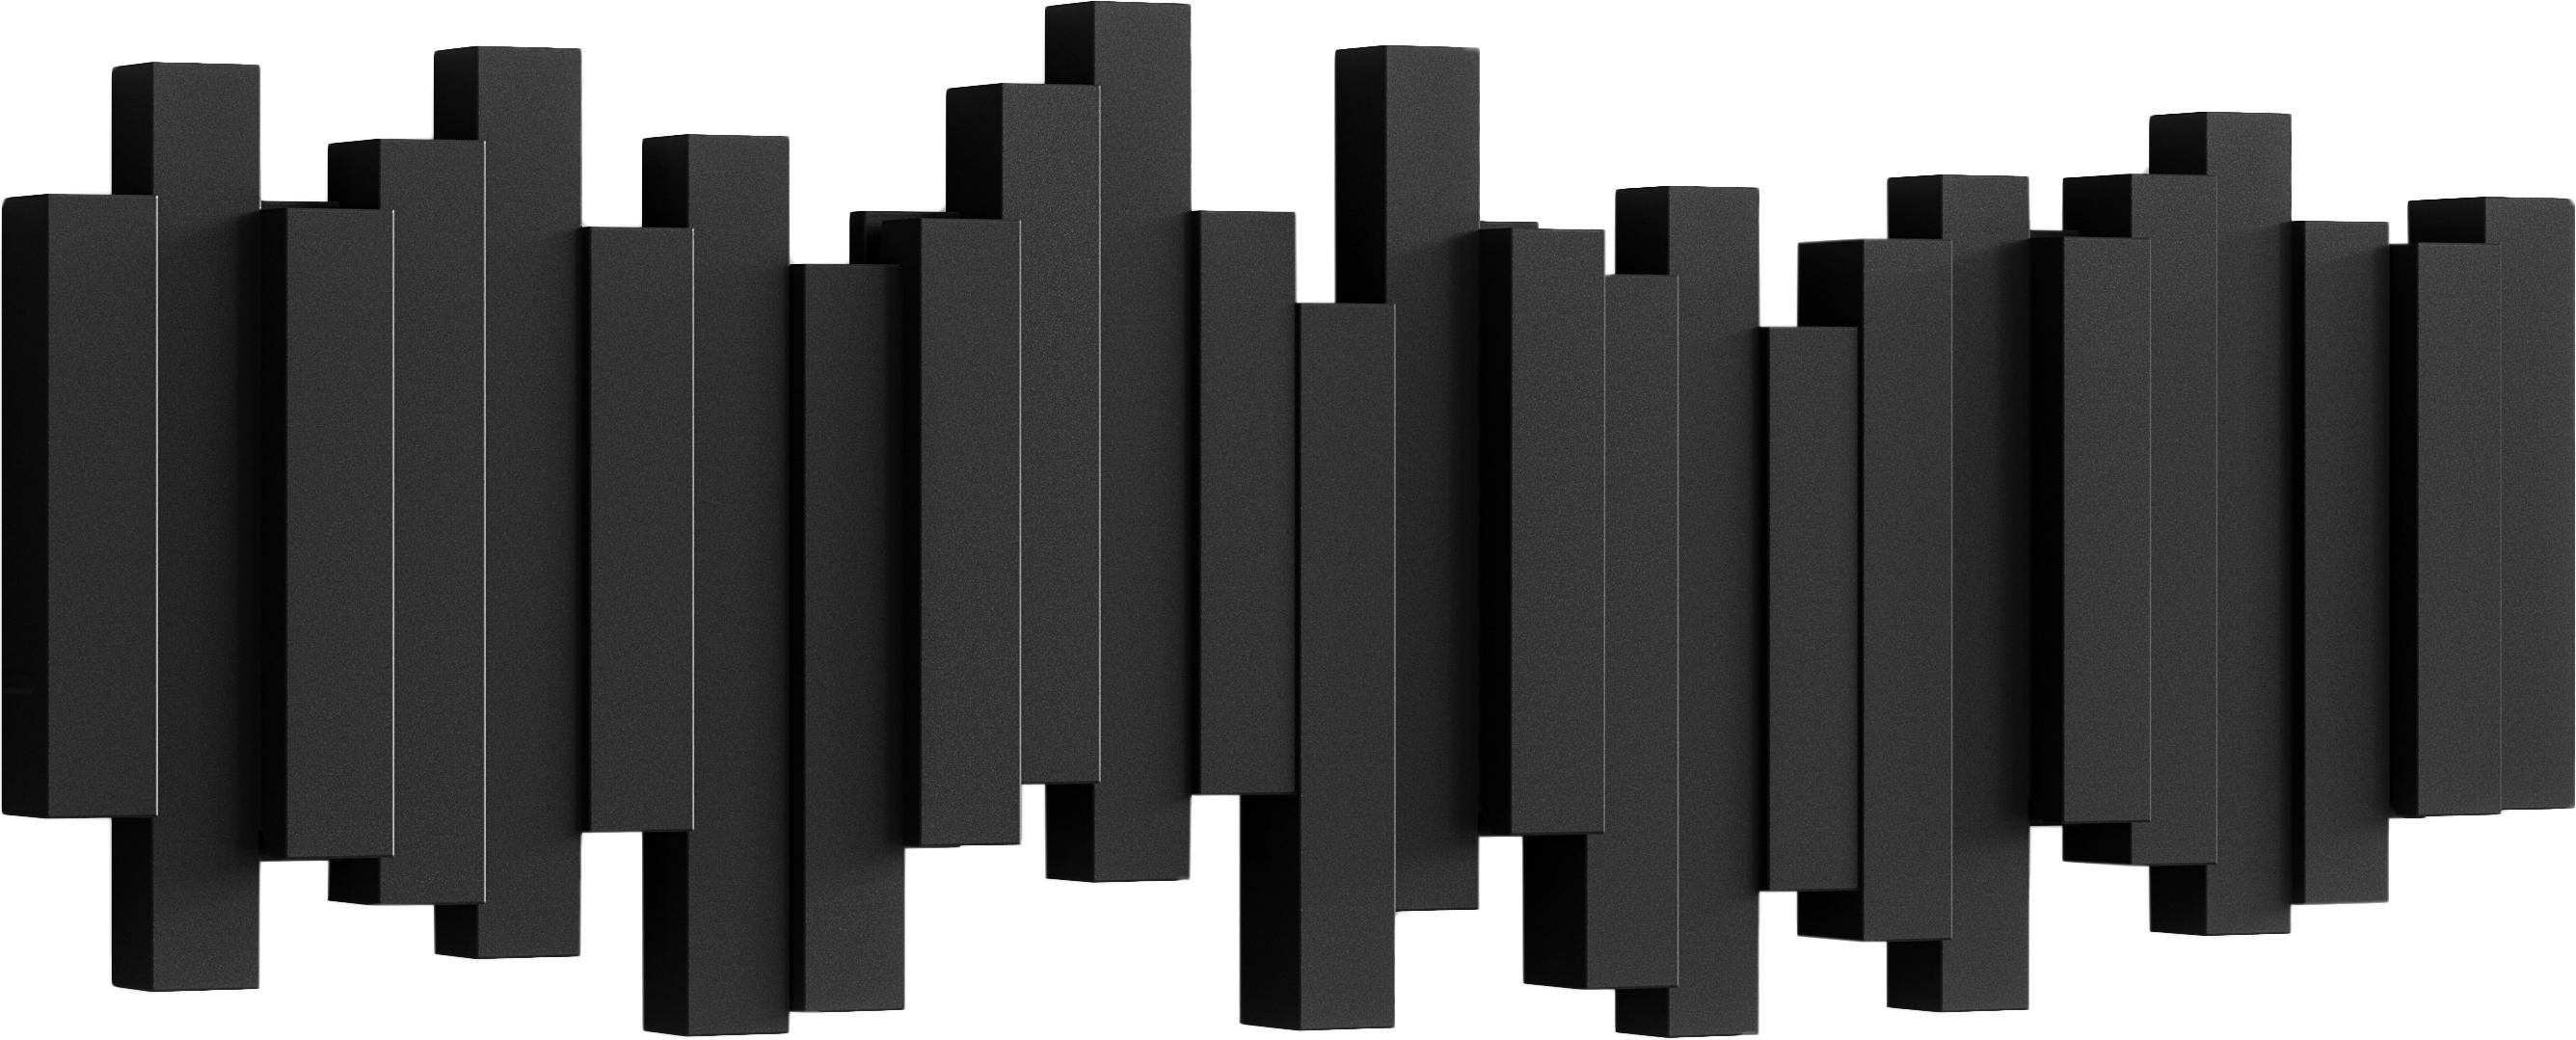 Ganci appendiabiti Sticks, Materiale sintetico, Nero, Larg. 48 x Alt. 18 cm